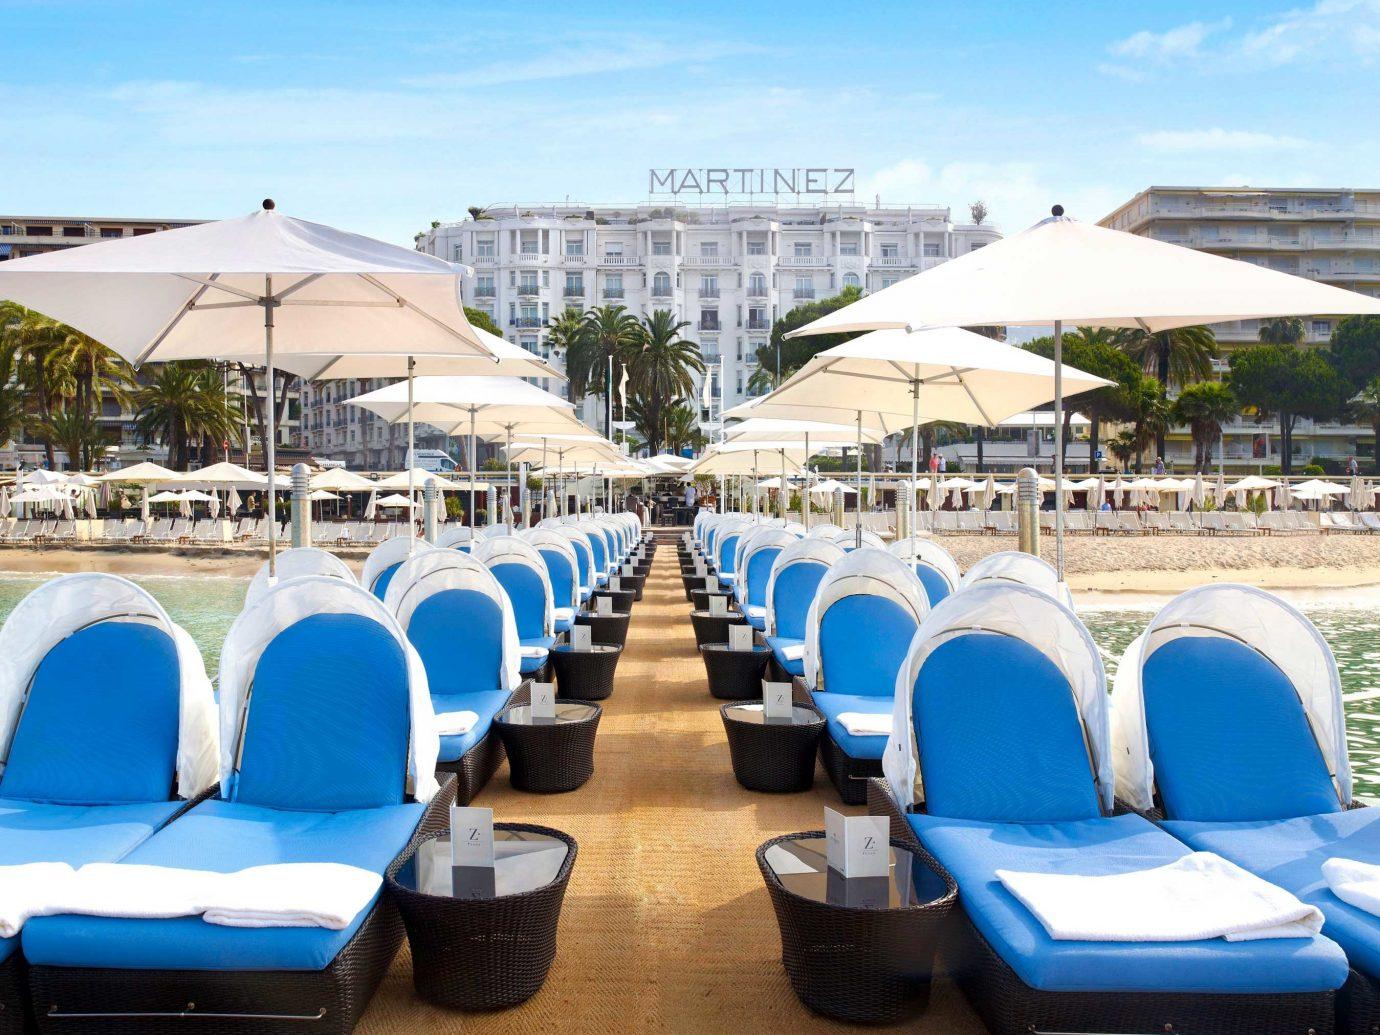 Beach at the Hôtel Martinez Cannes by Hyatt